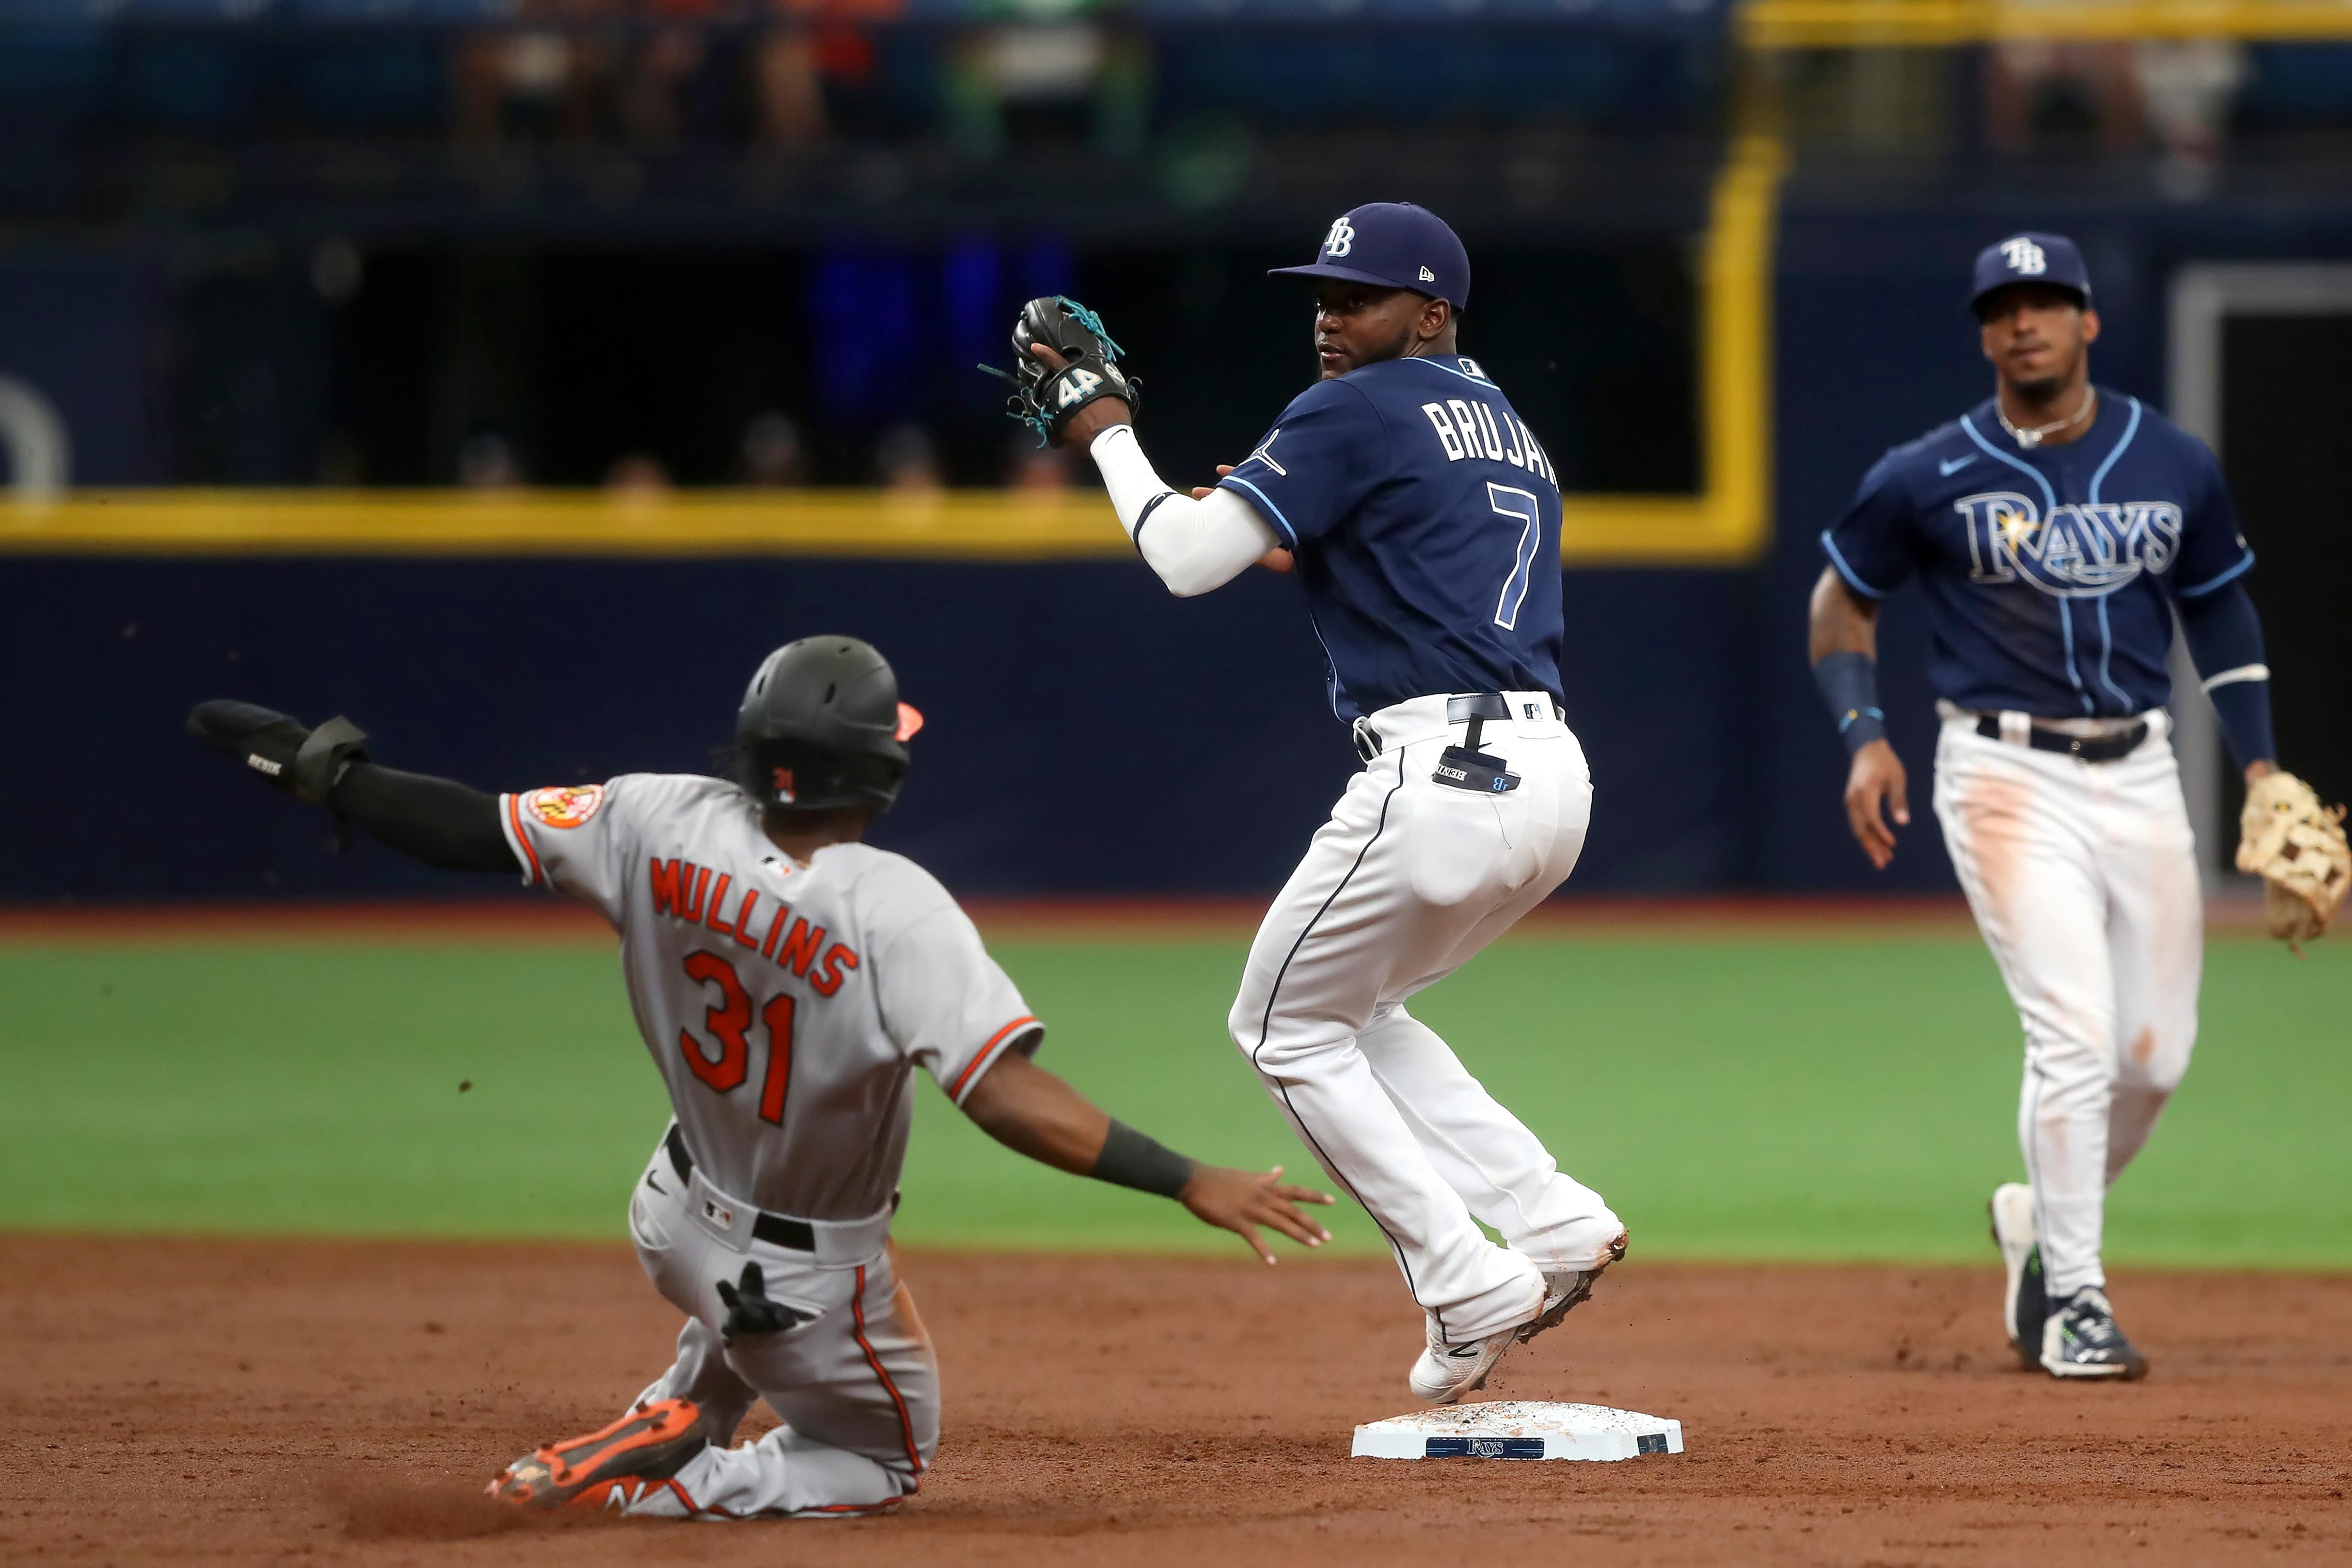 MLB: JUL 21 Orioles at Rays